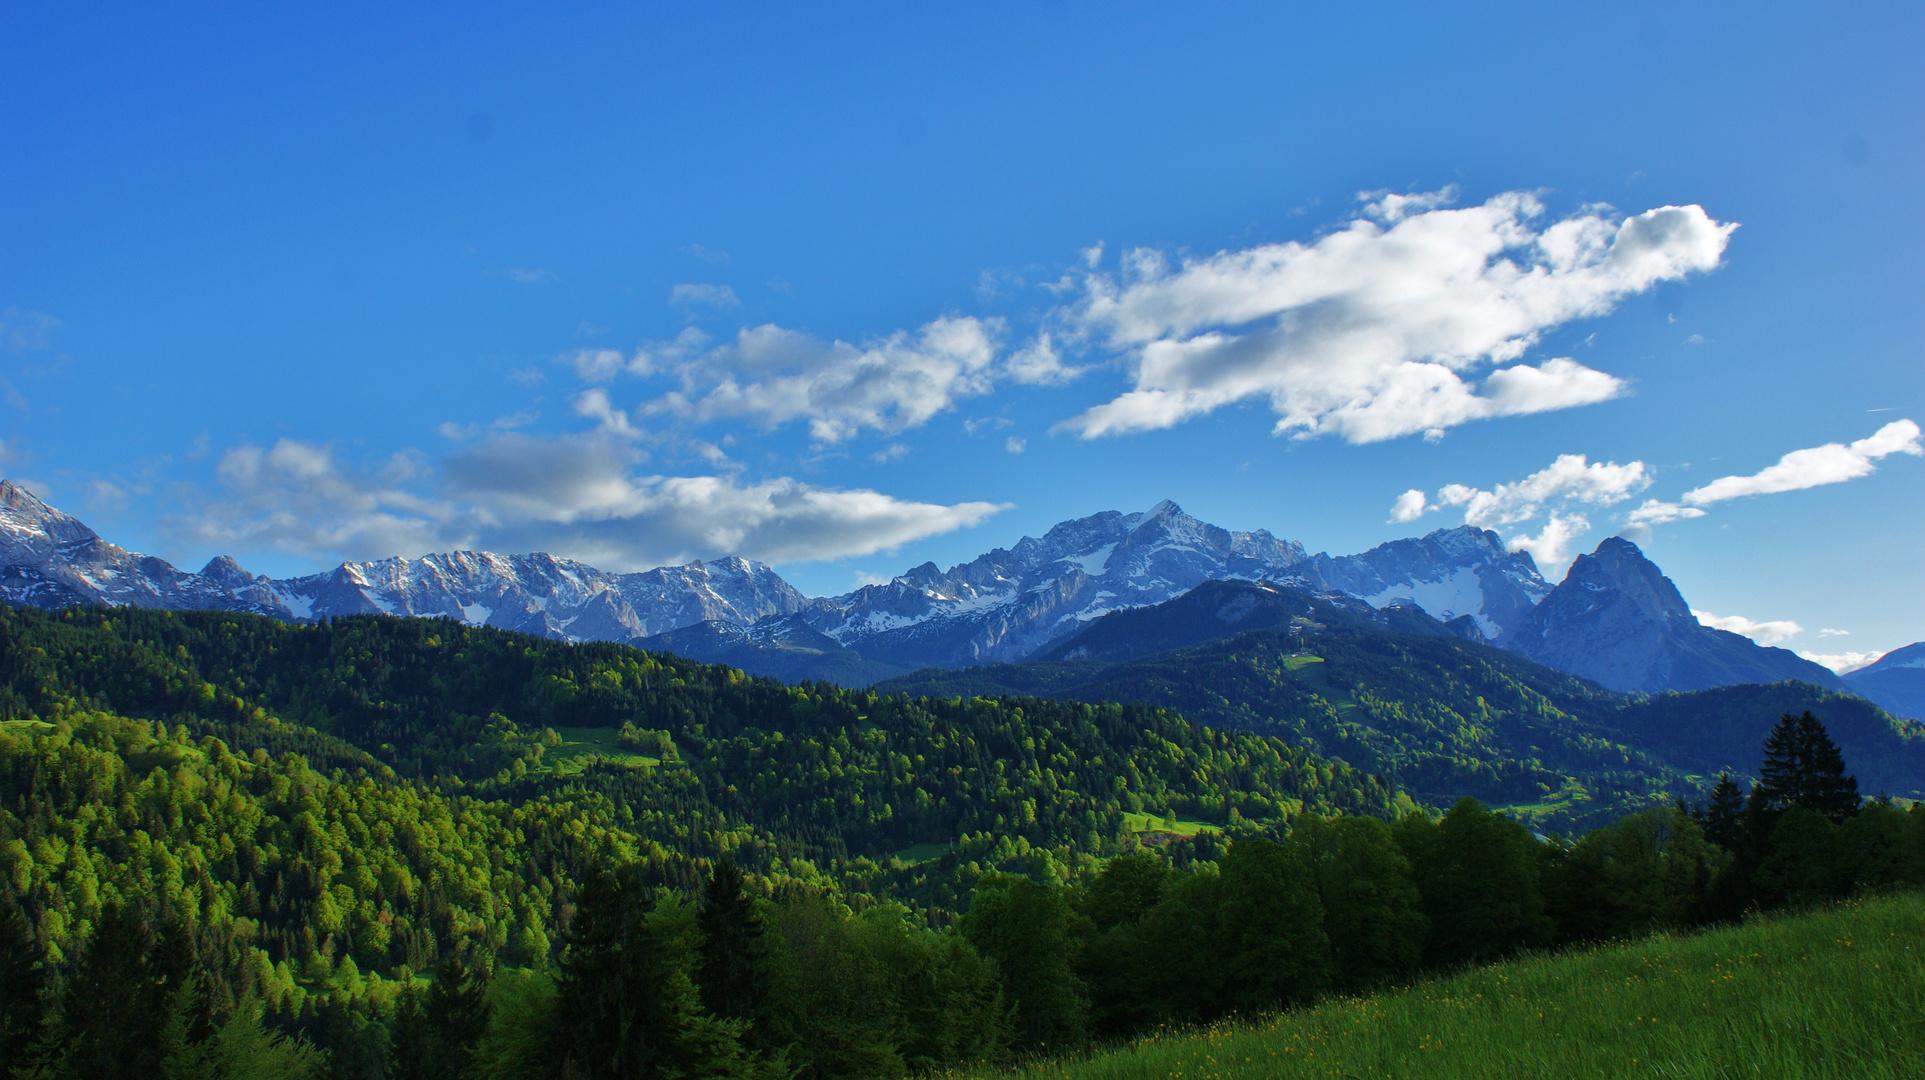 spring in the alps